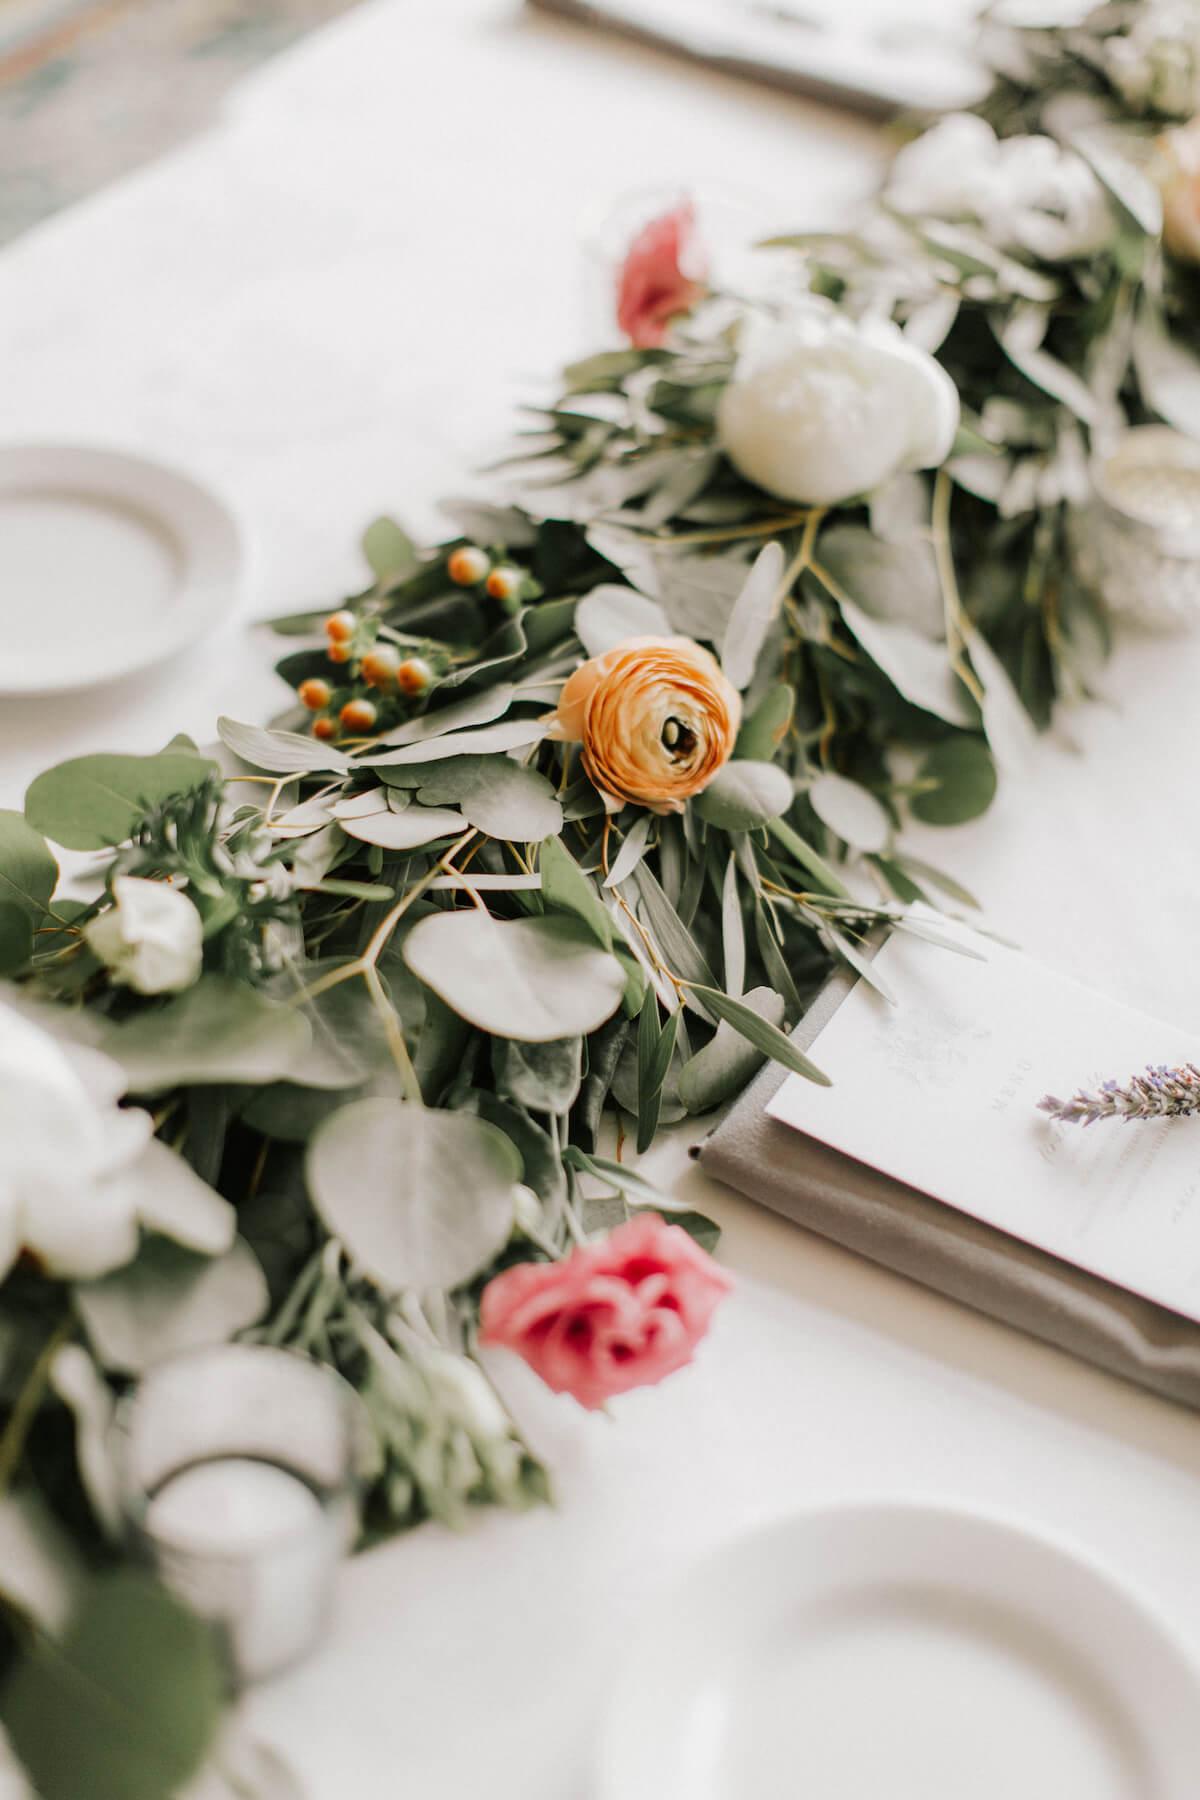 floral-centerpiece-wedding-table-setting.jpg